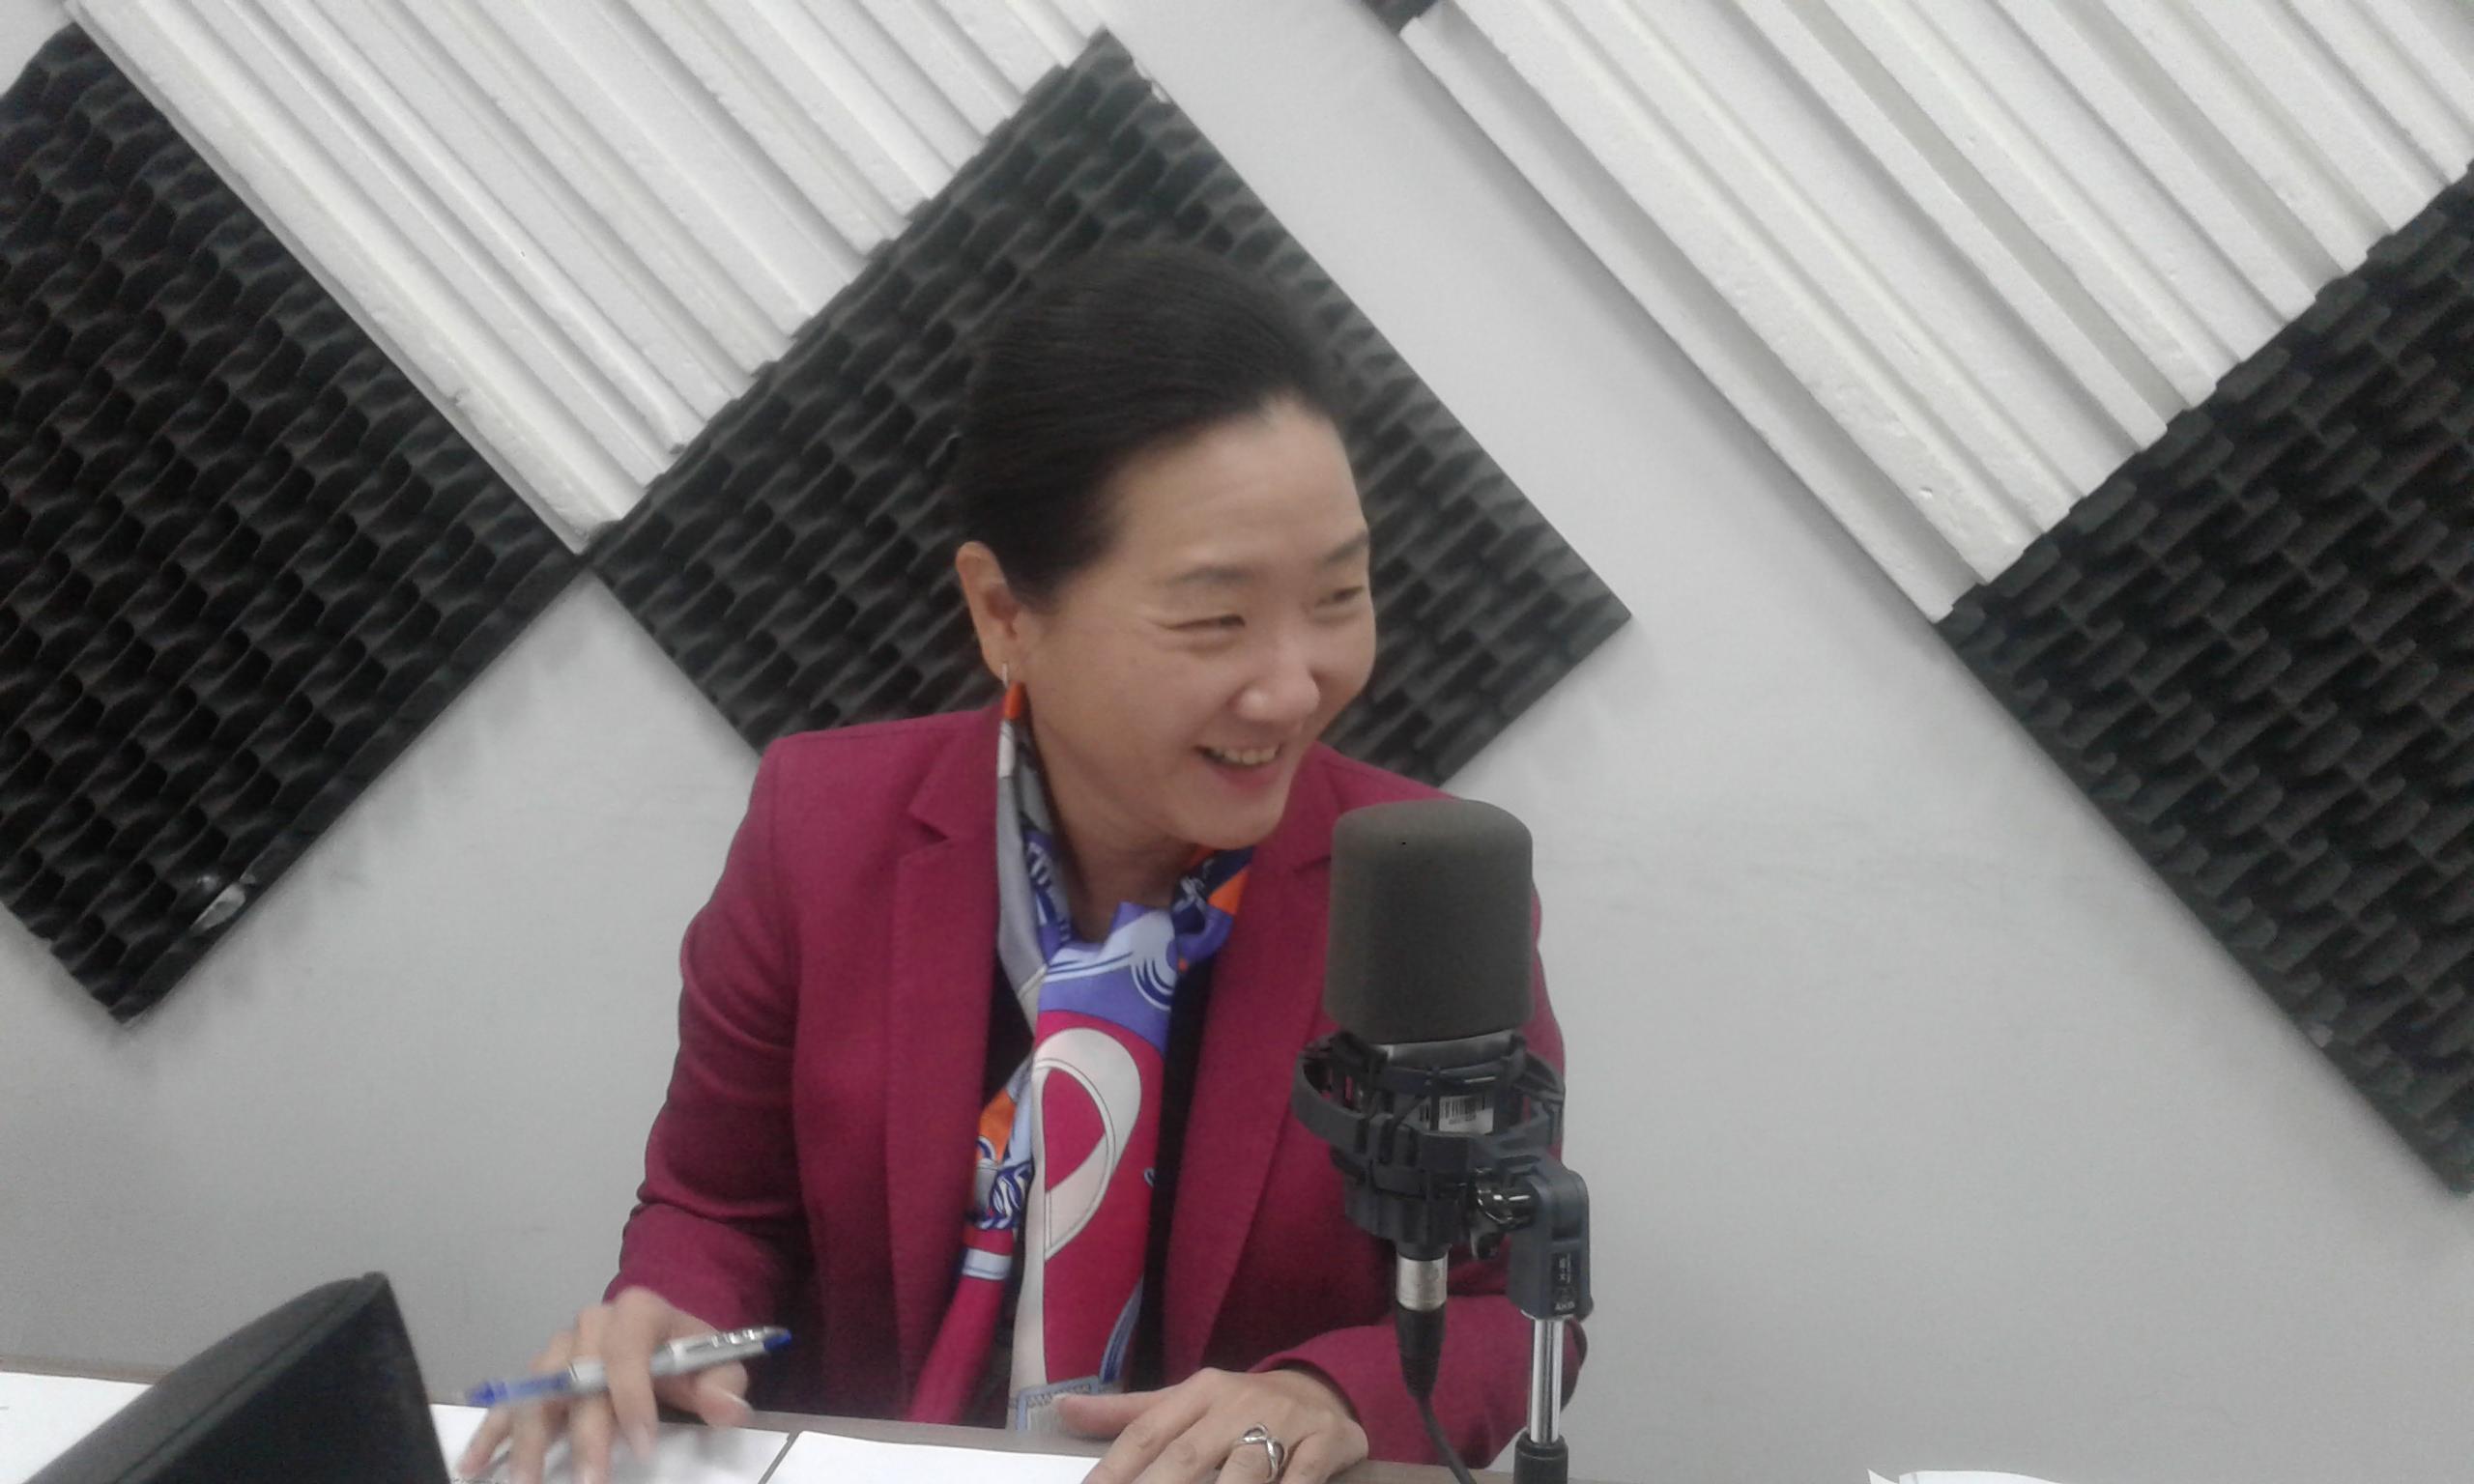 100 días de la Asamblea Nacional - Kyungnan Park : Agenda 2030